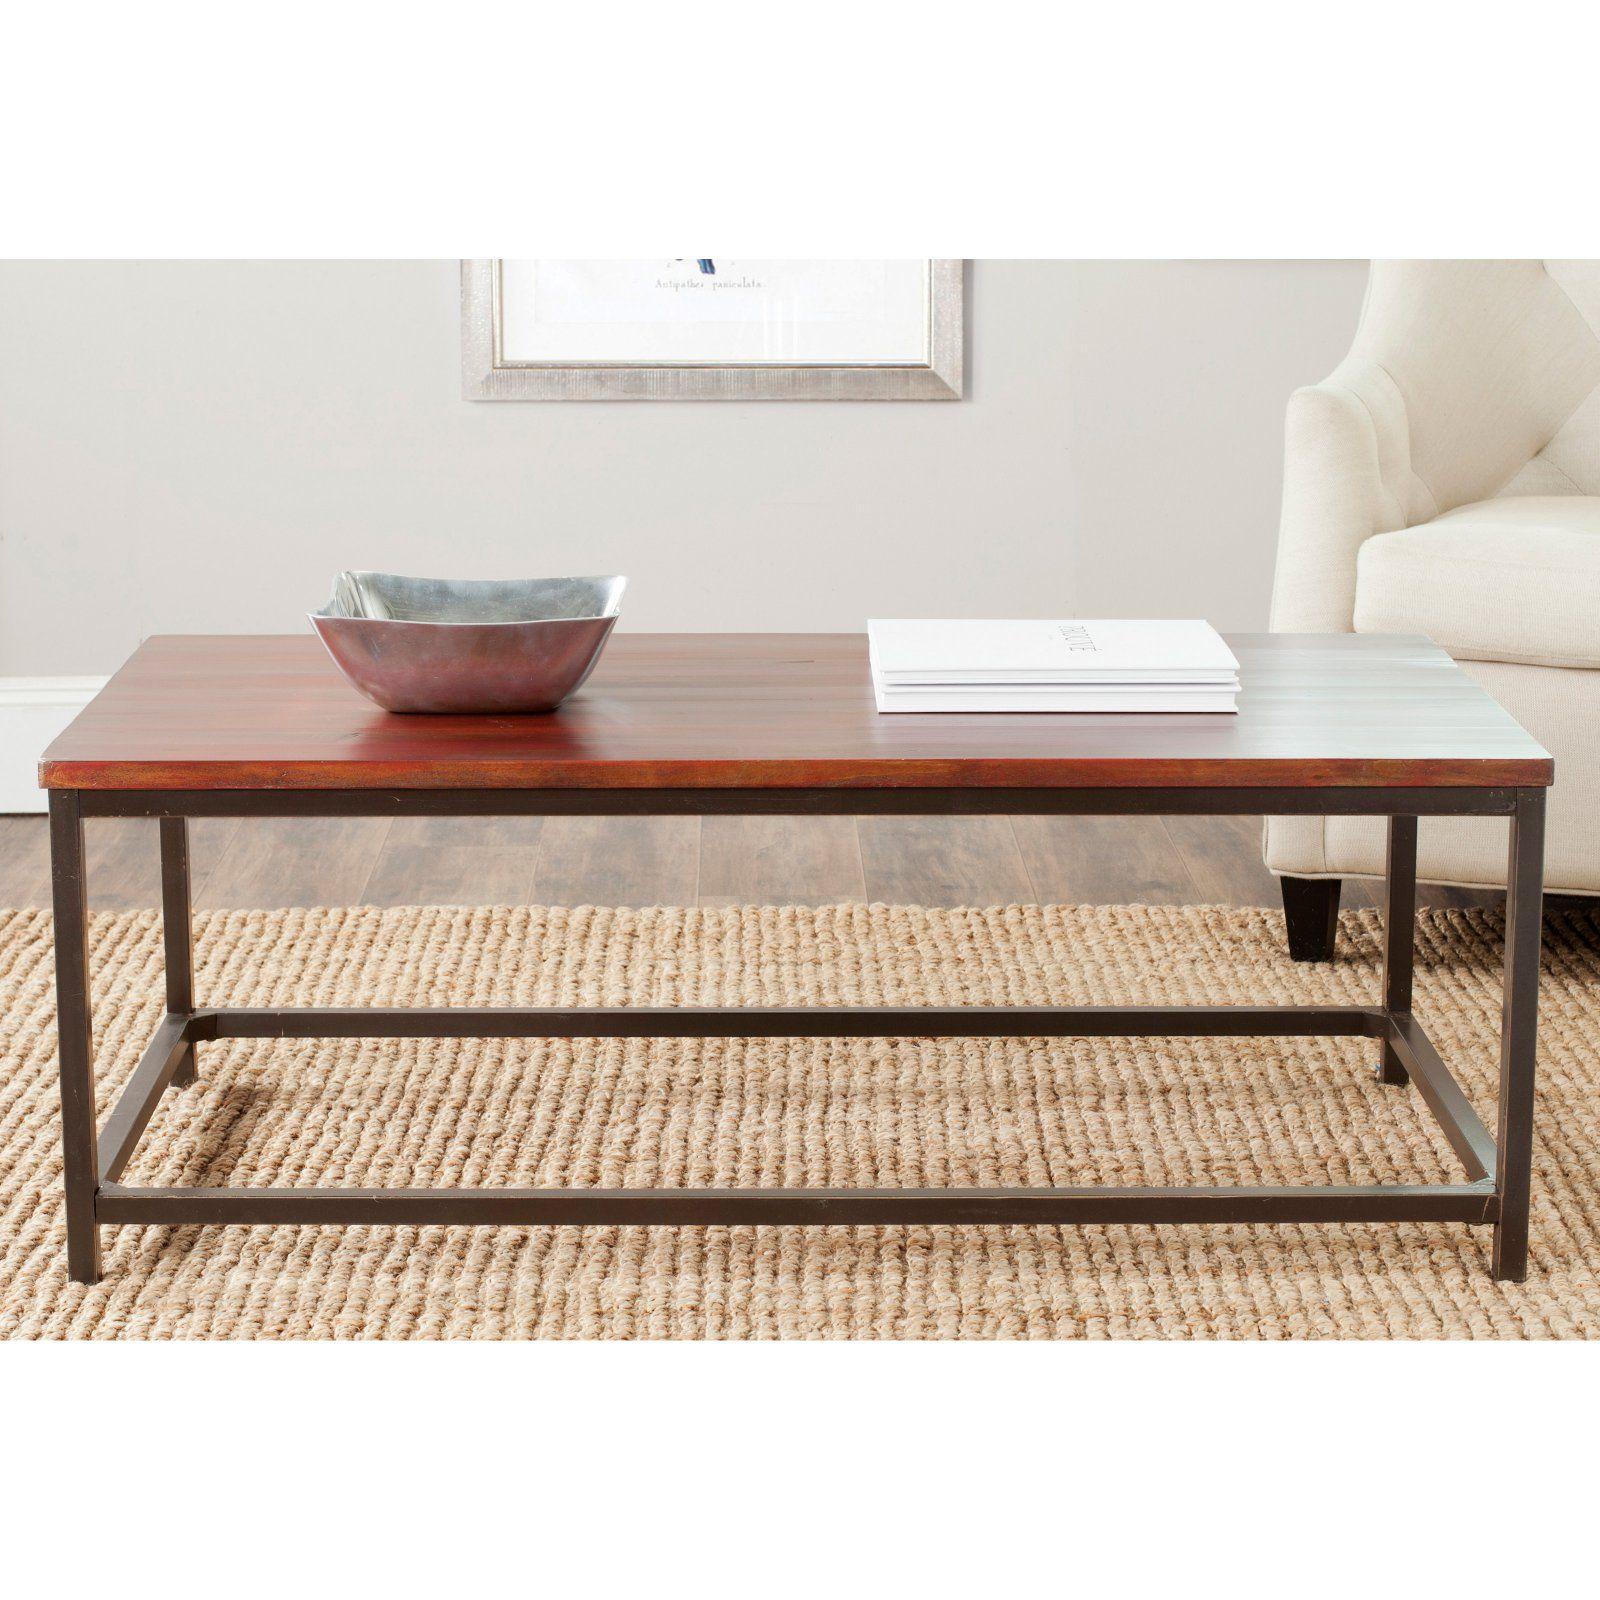 Safavieh Alec Coffee Table Distressed Maroon In 2019 Furniture Black Coffee Tables Barnwood Coffee Table